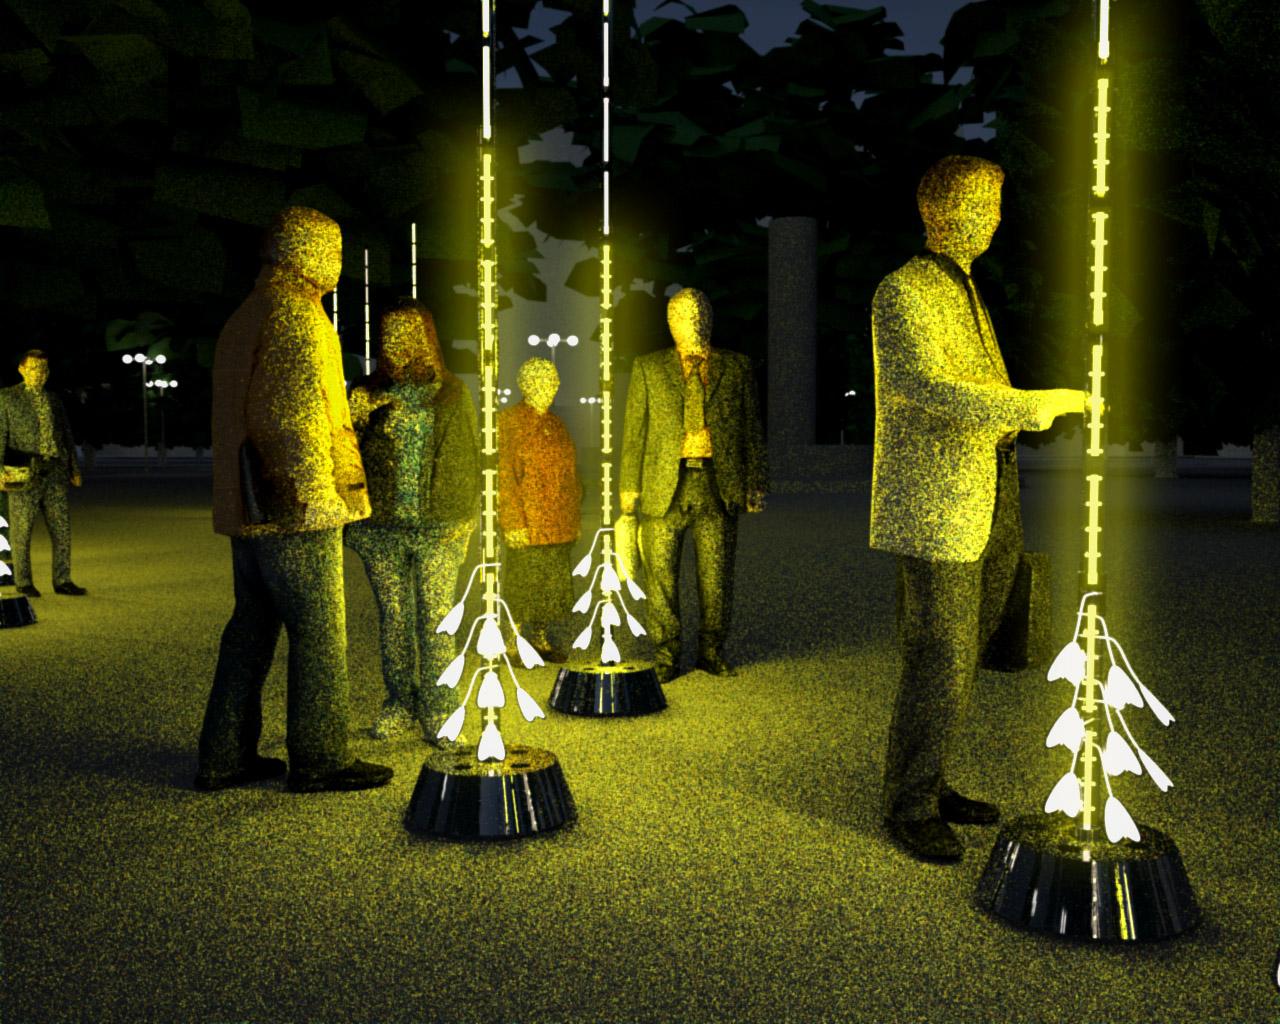 FUTUREFORMS-LIGHTFIELDS-04.jpg